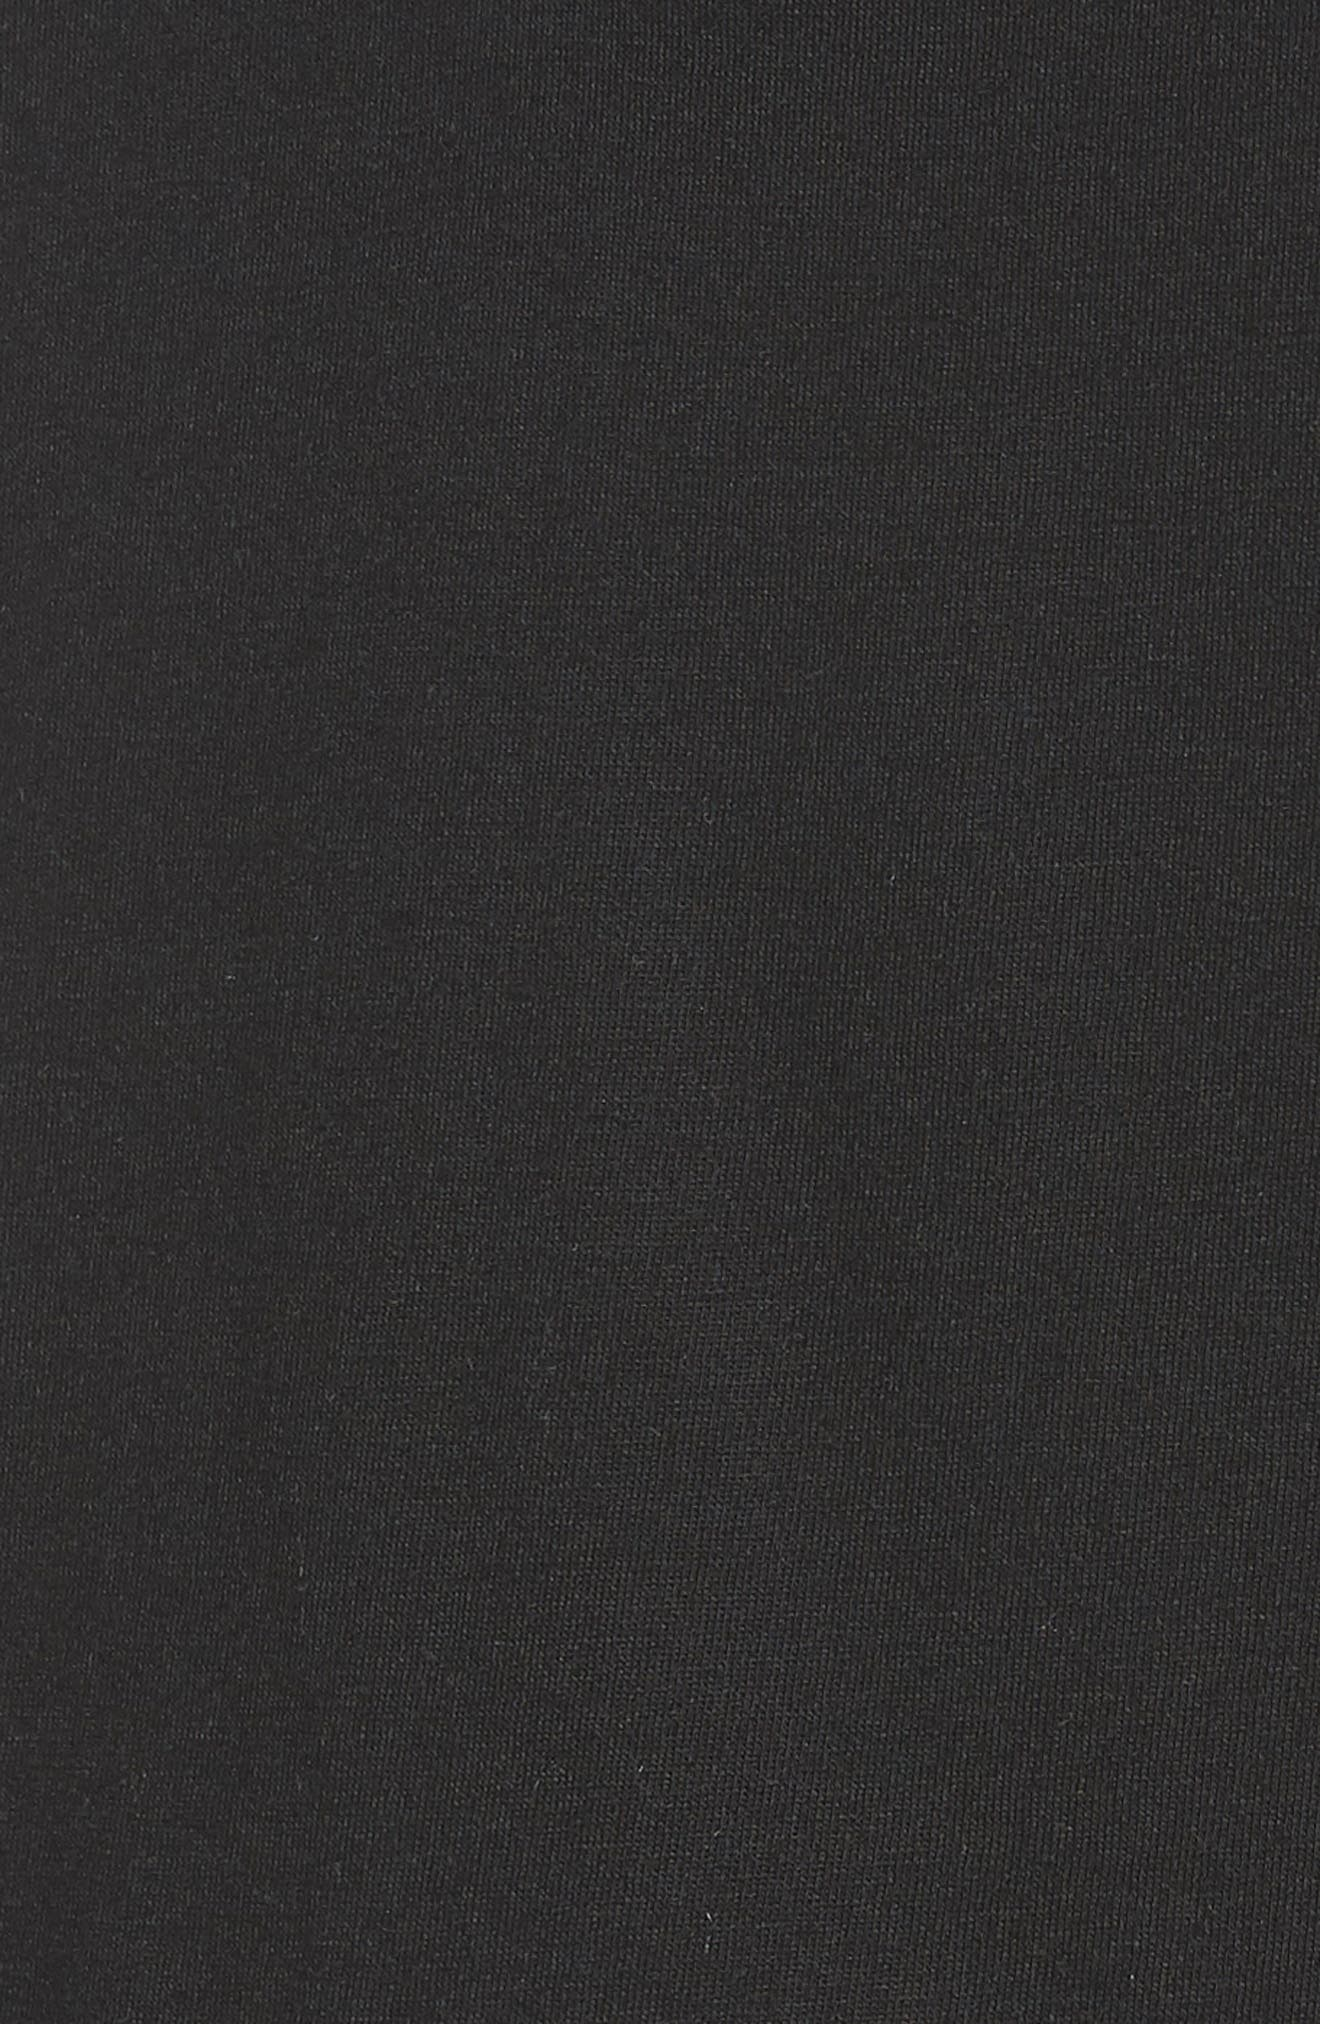 Mix Media Cotton Blend Peplum Top,                             Alternate thumbnail 6, color,                             001